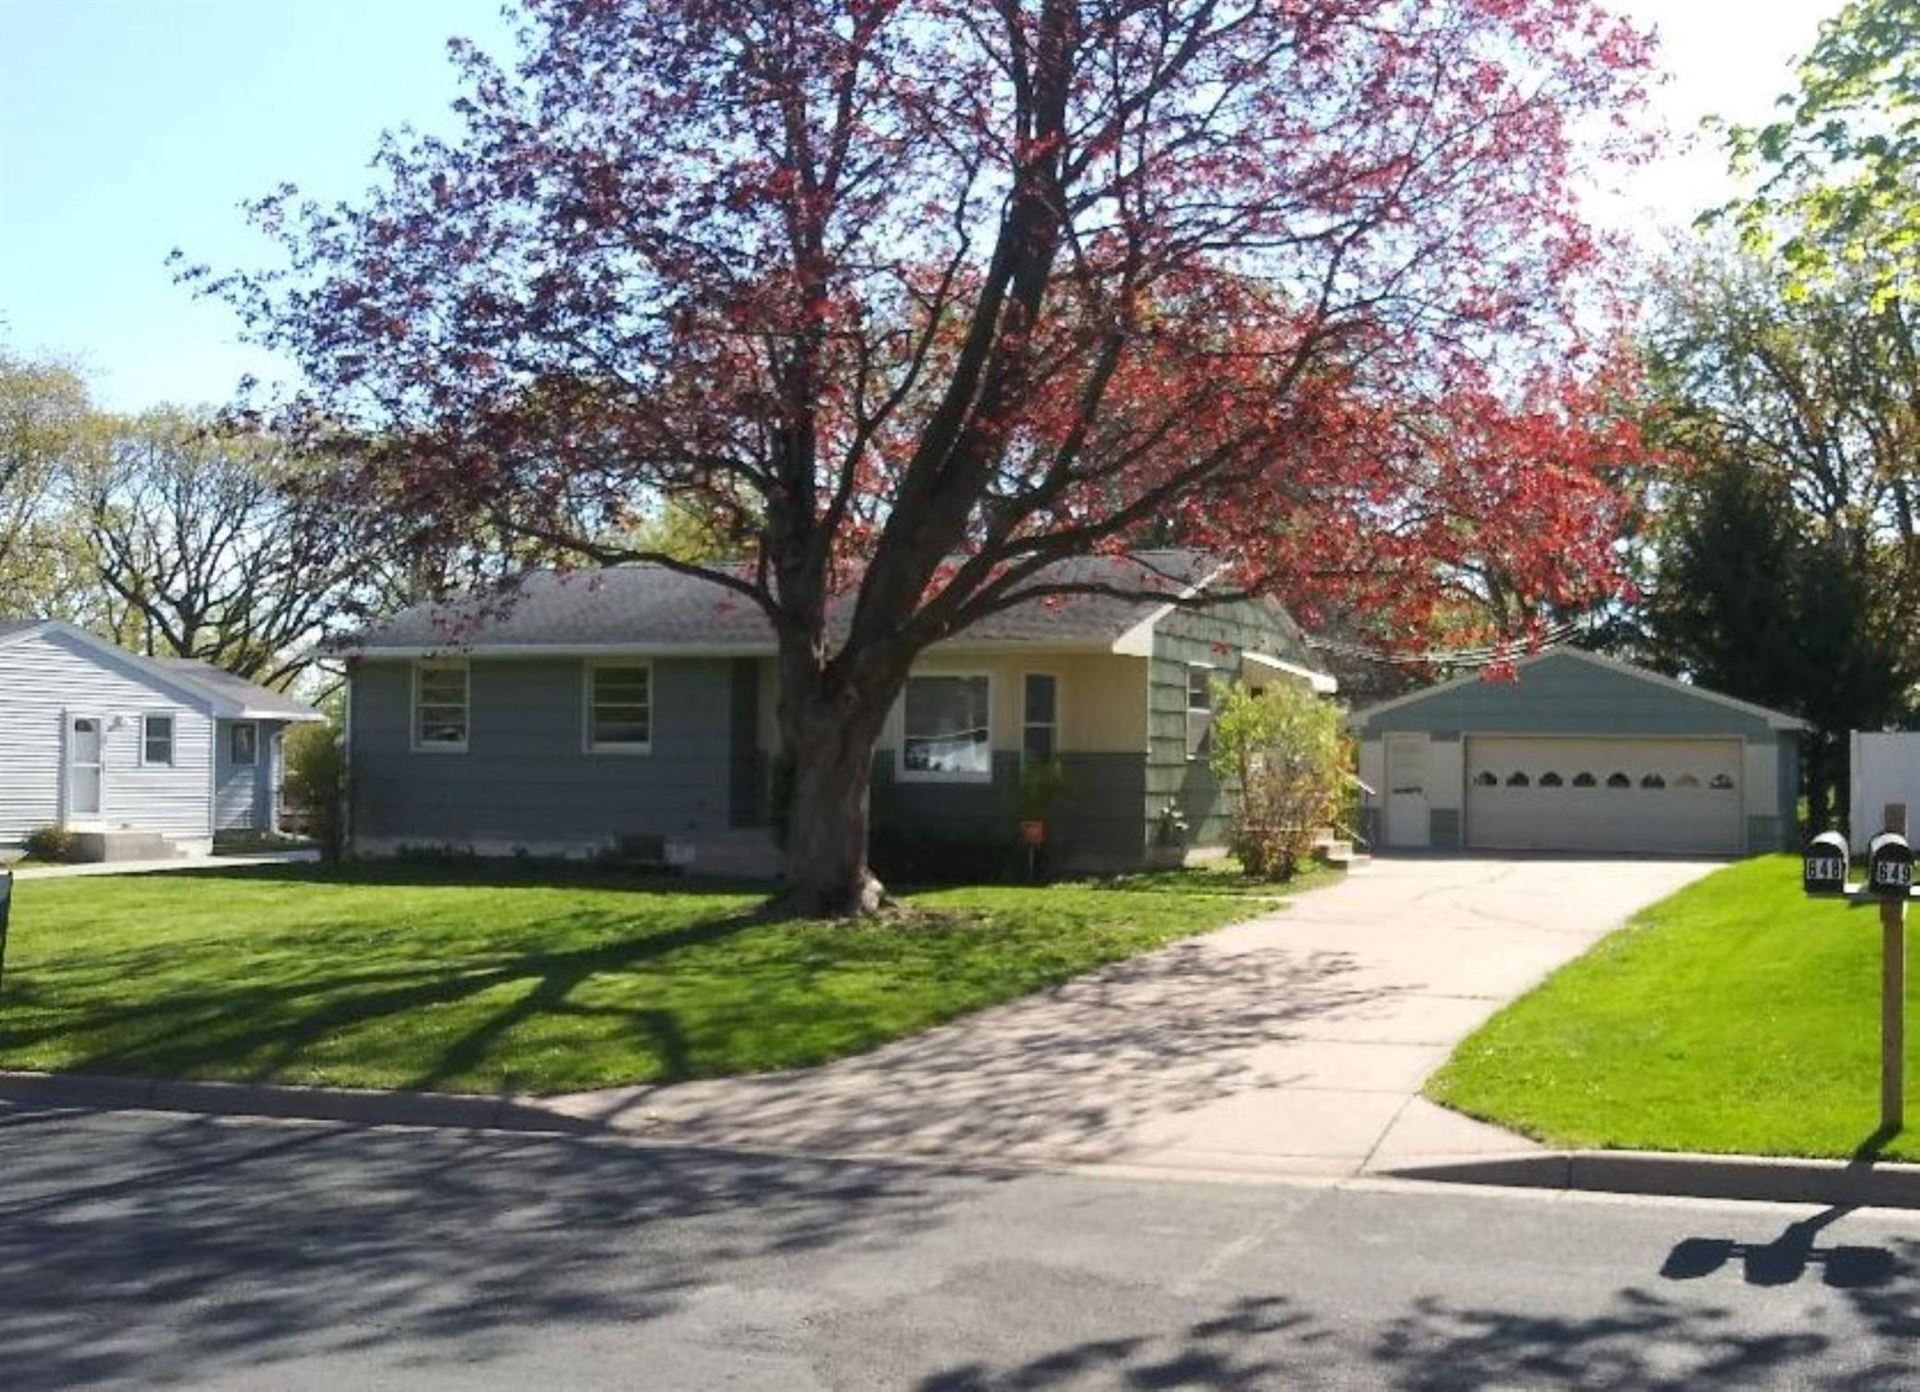 649 Hattie Lane, Woodbury, MN 55125 - MLS#: 5743696